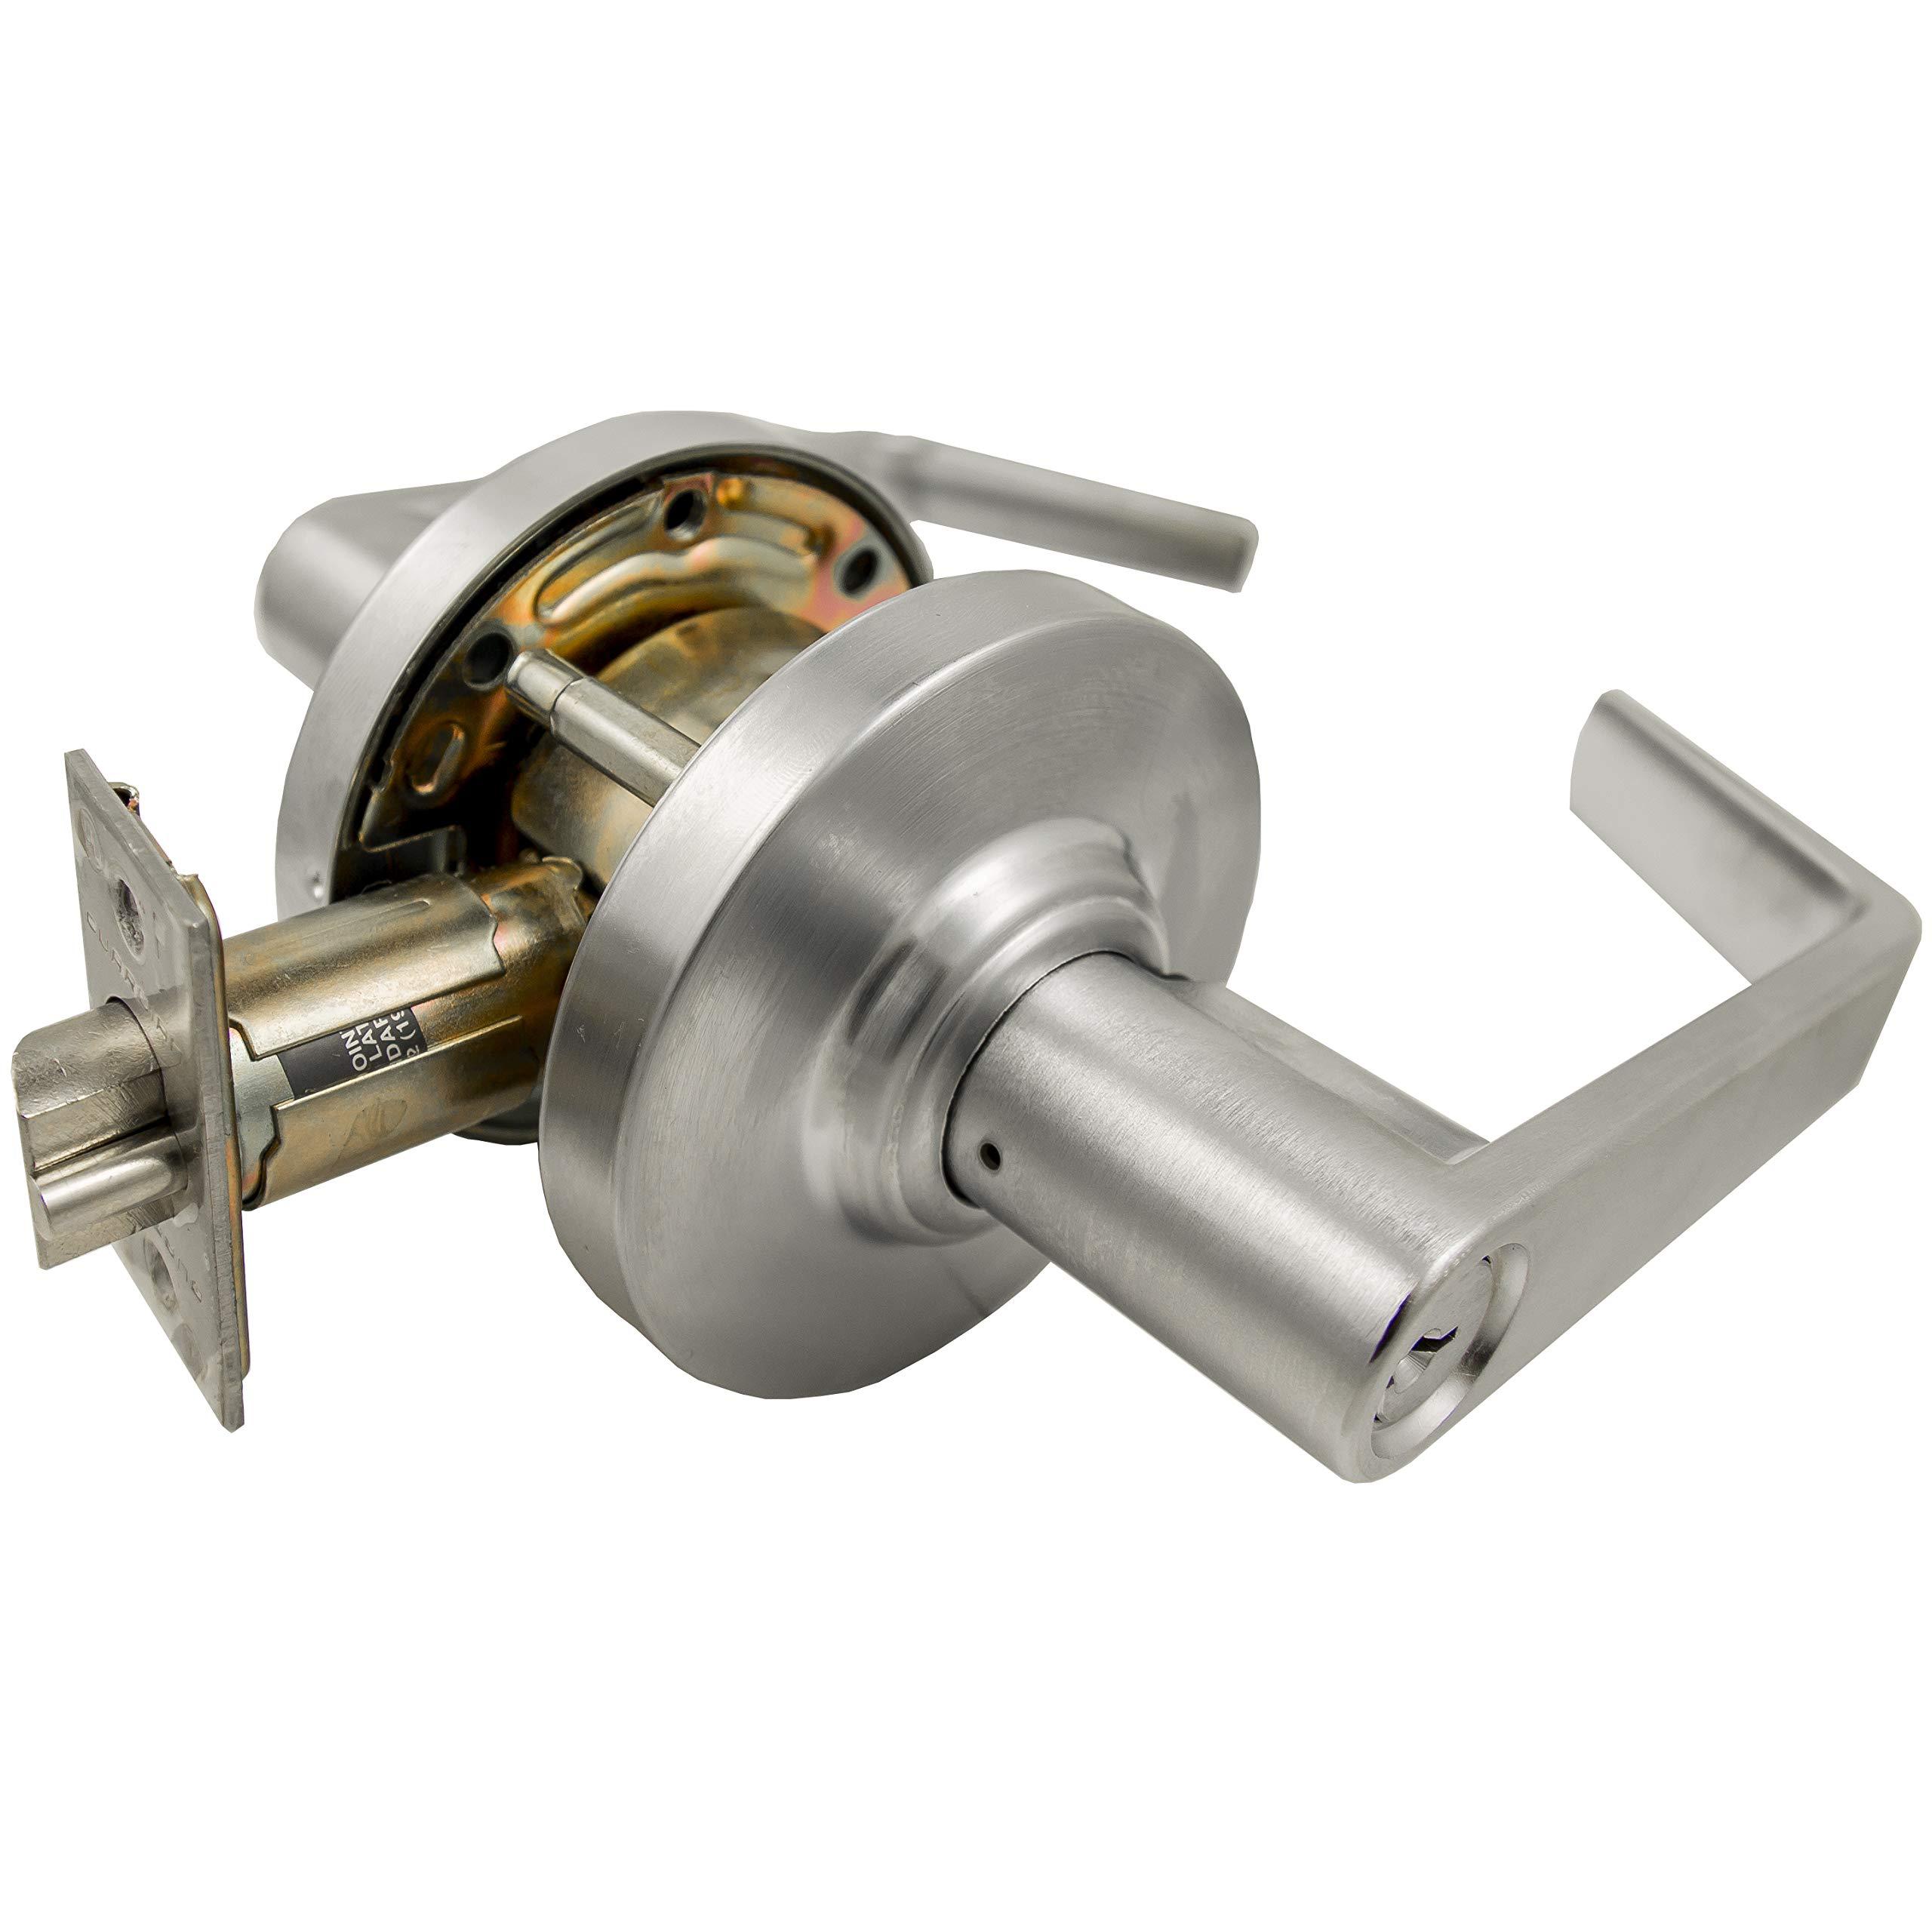 K2G Commercial Door Lever Lock Handle Grade 2 Heavy Duty Keyed Entry 26D